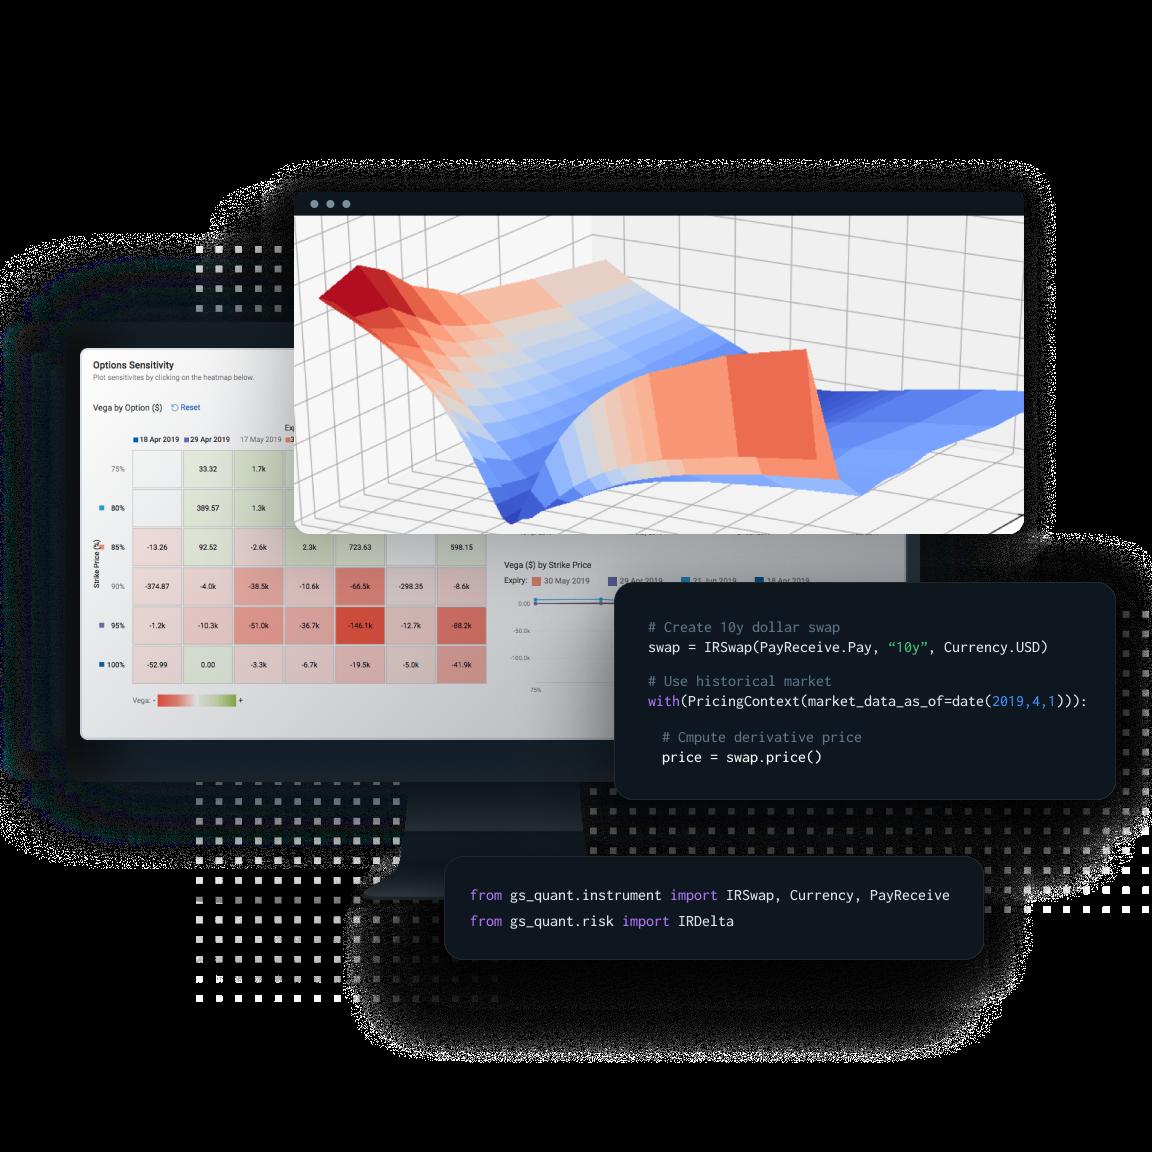 Data Risk Analytics derivative Pricing Risk market Tested Models2x V2